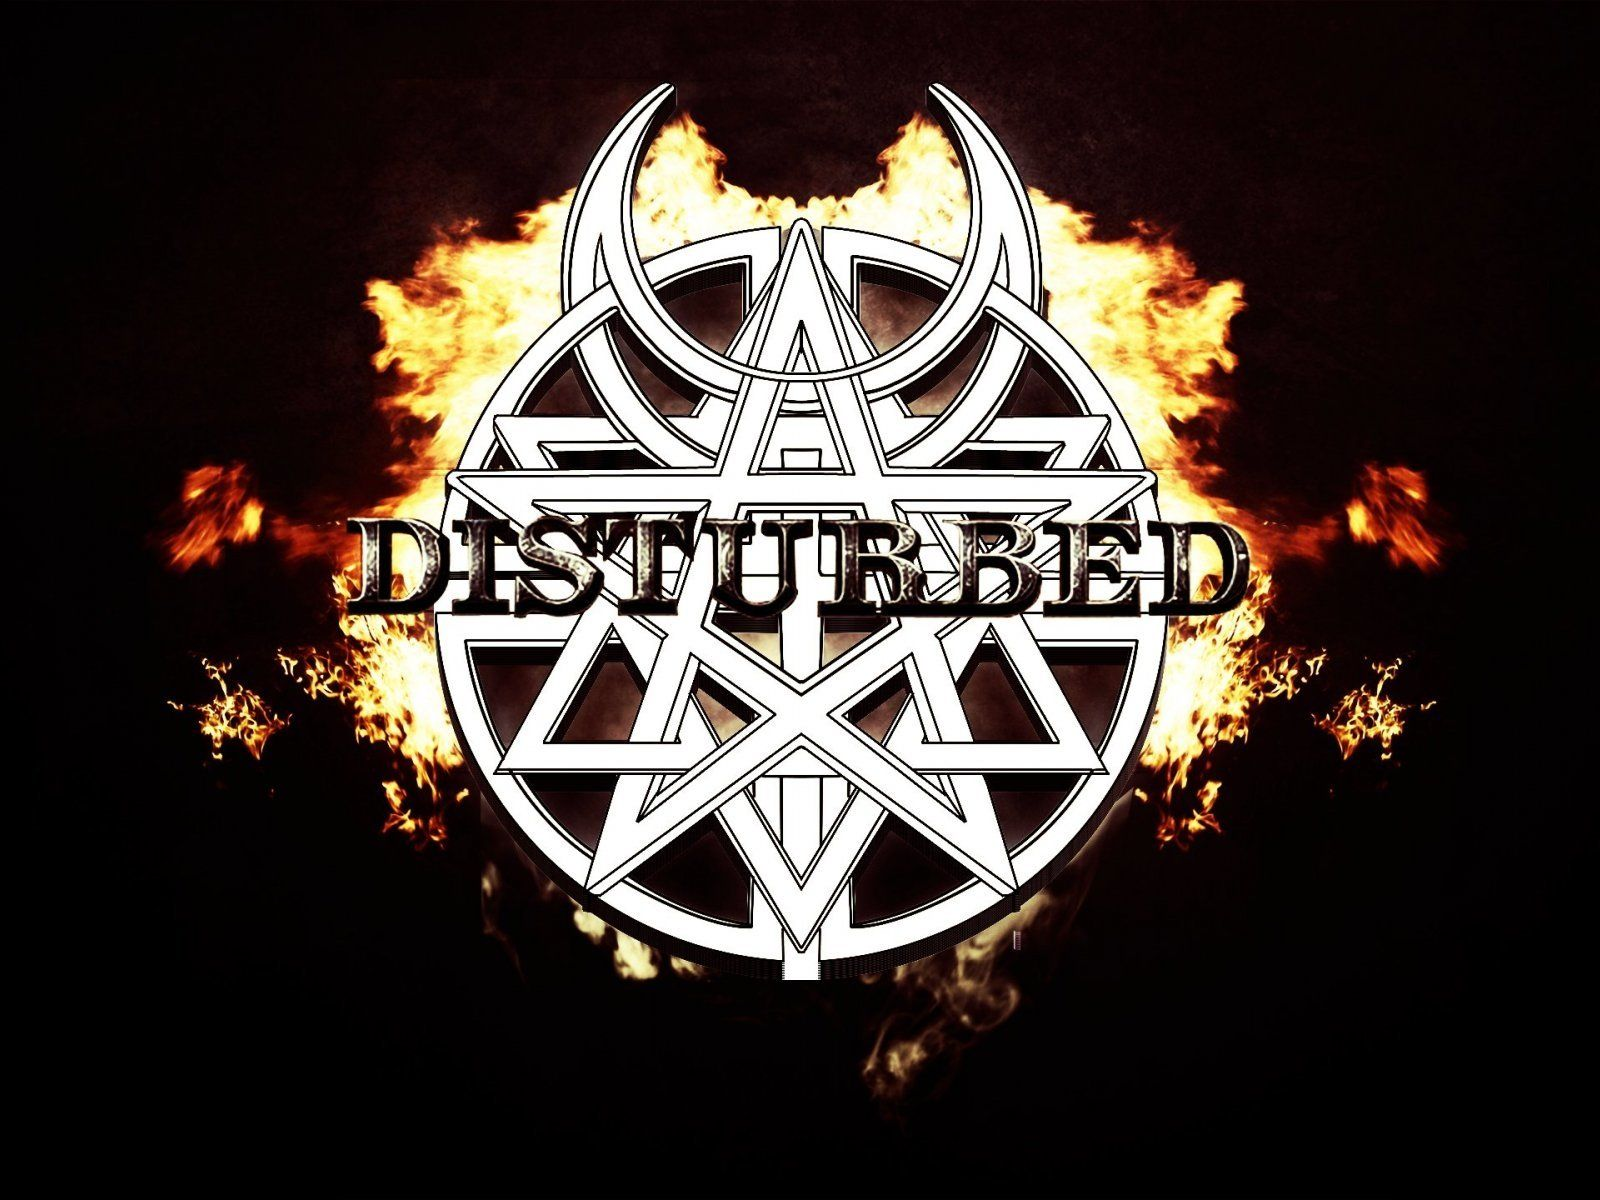 Music Disturbed Disturbed (Band) Heavy Metal Wallpaper